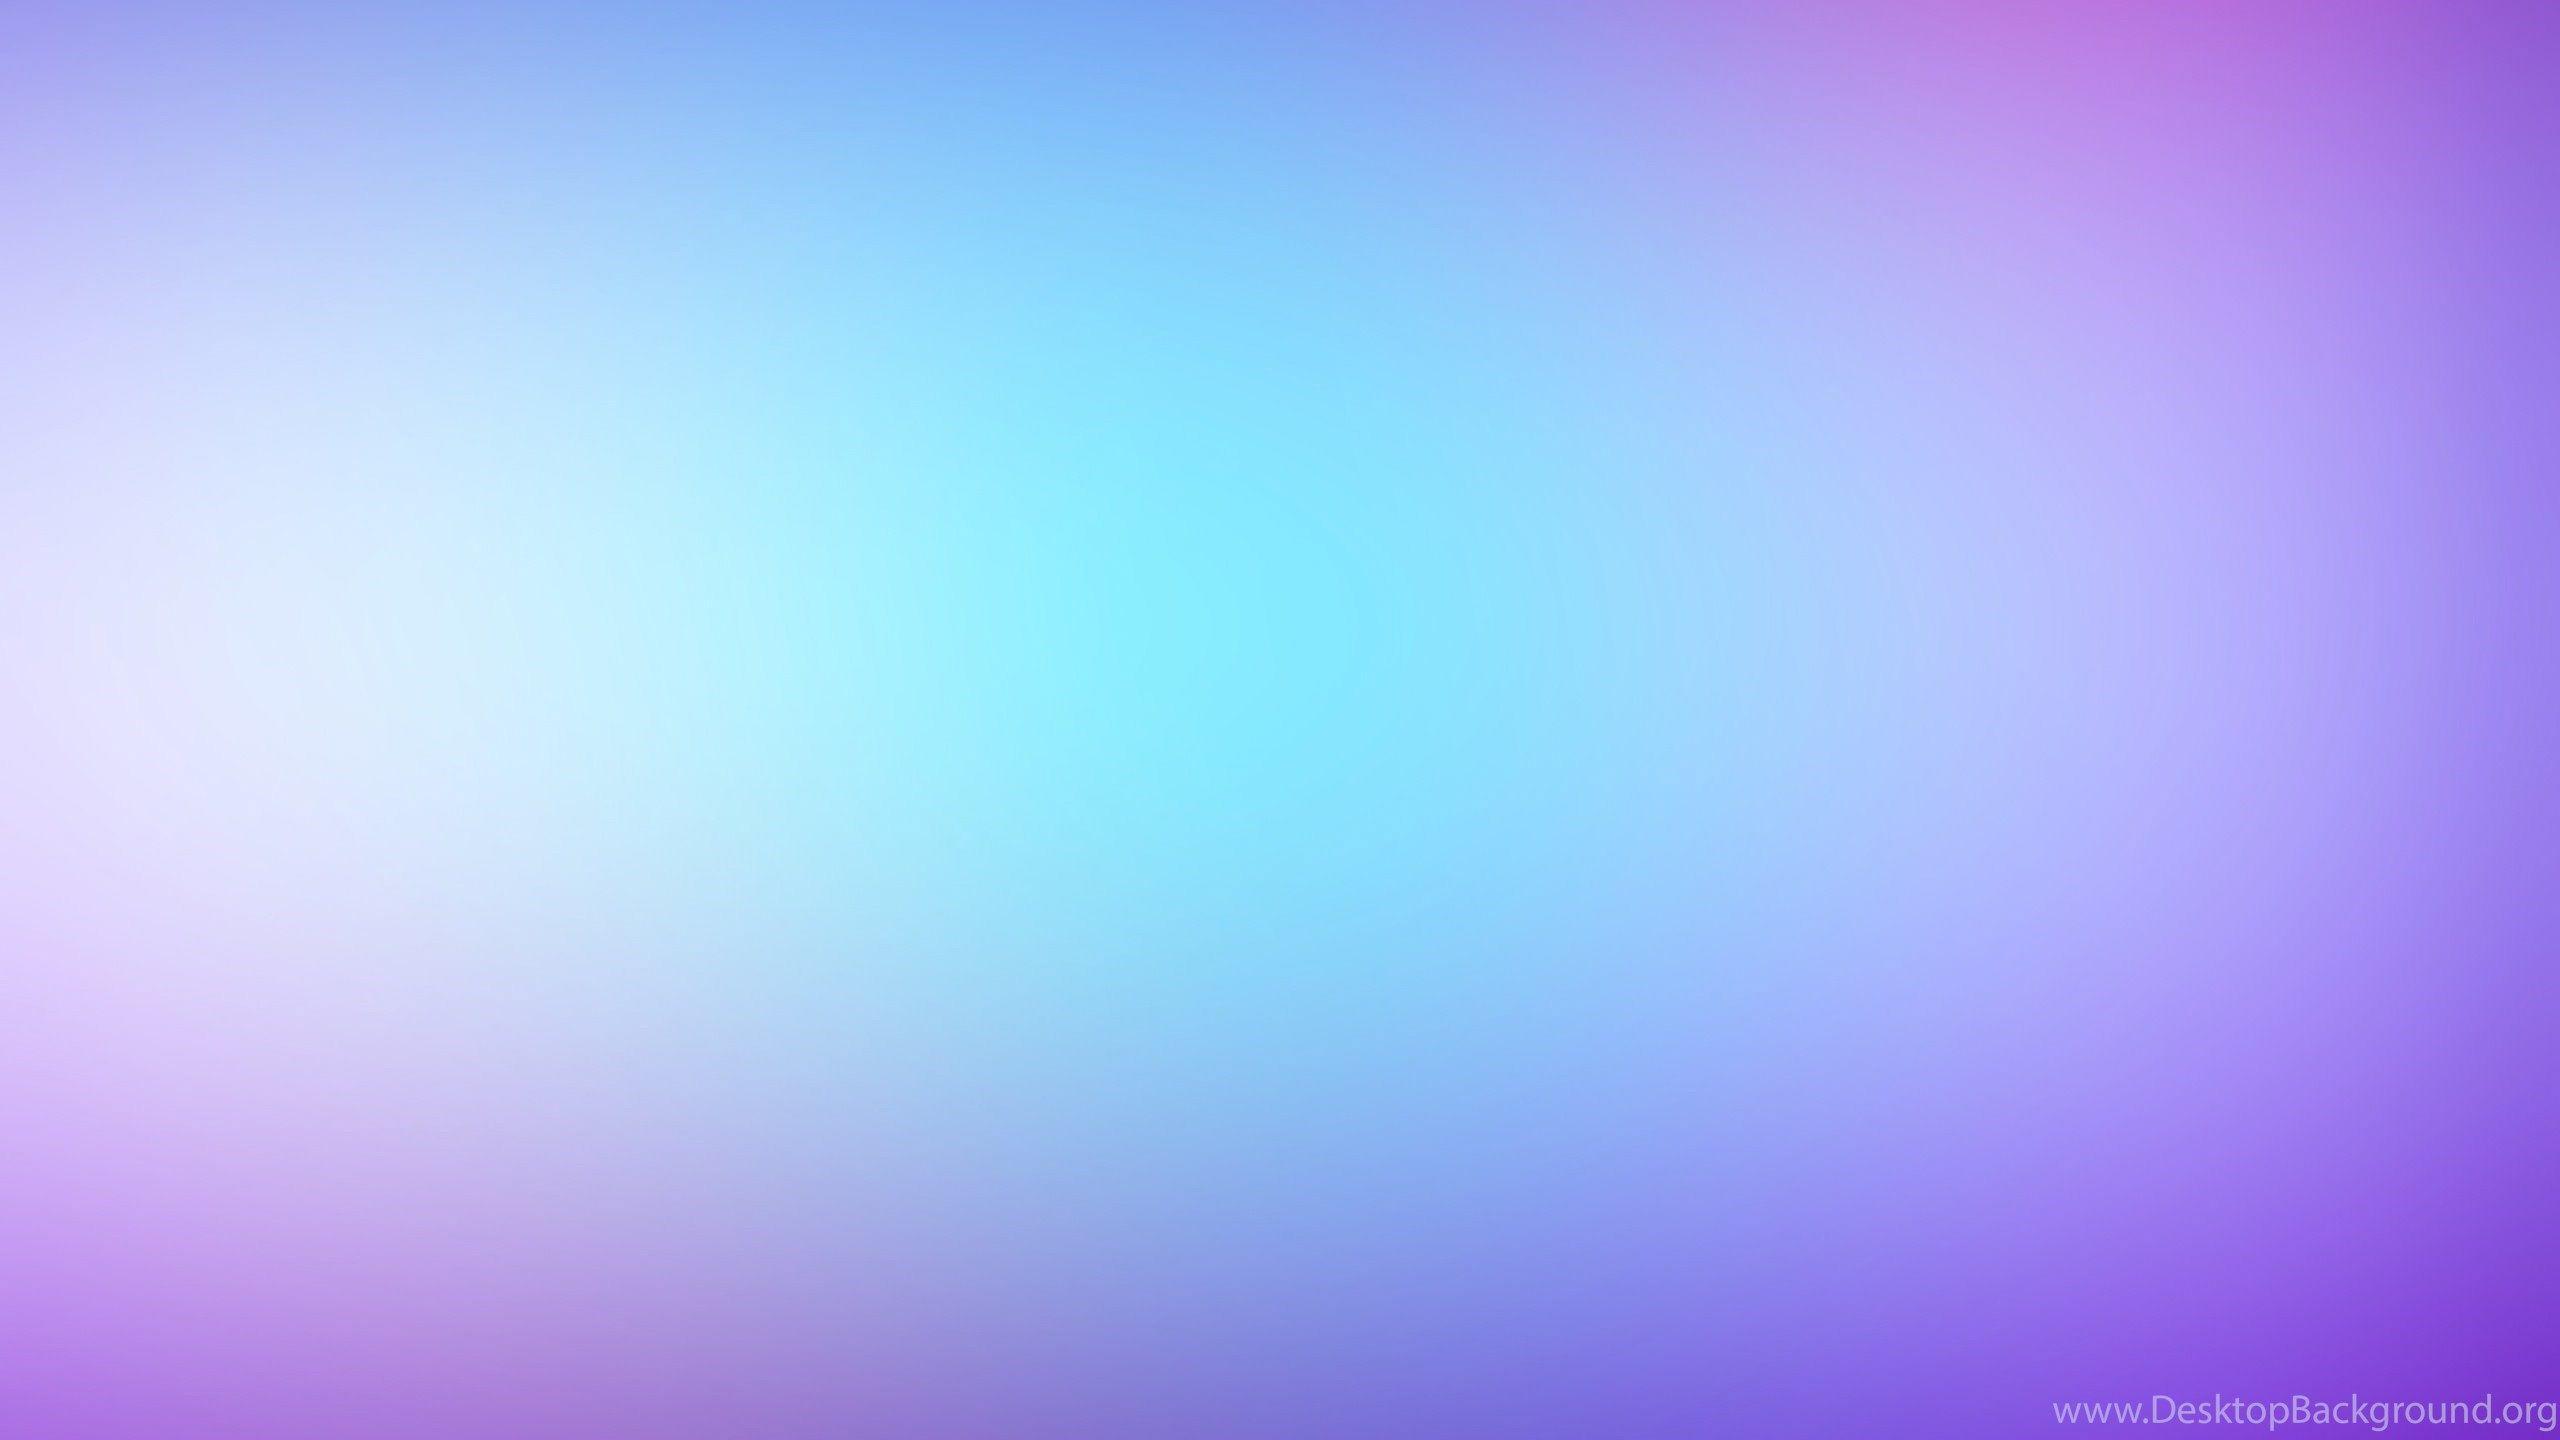 HD Wallpapers 1080p Colors - Wallpaper Cave